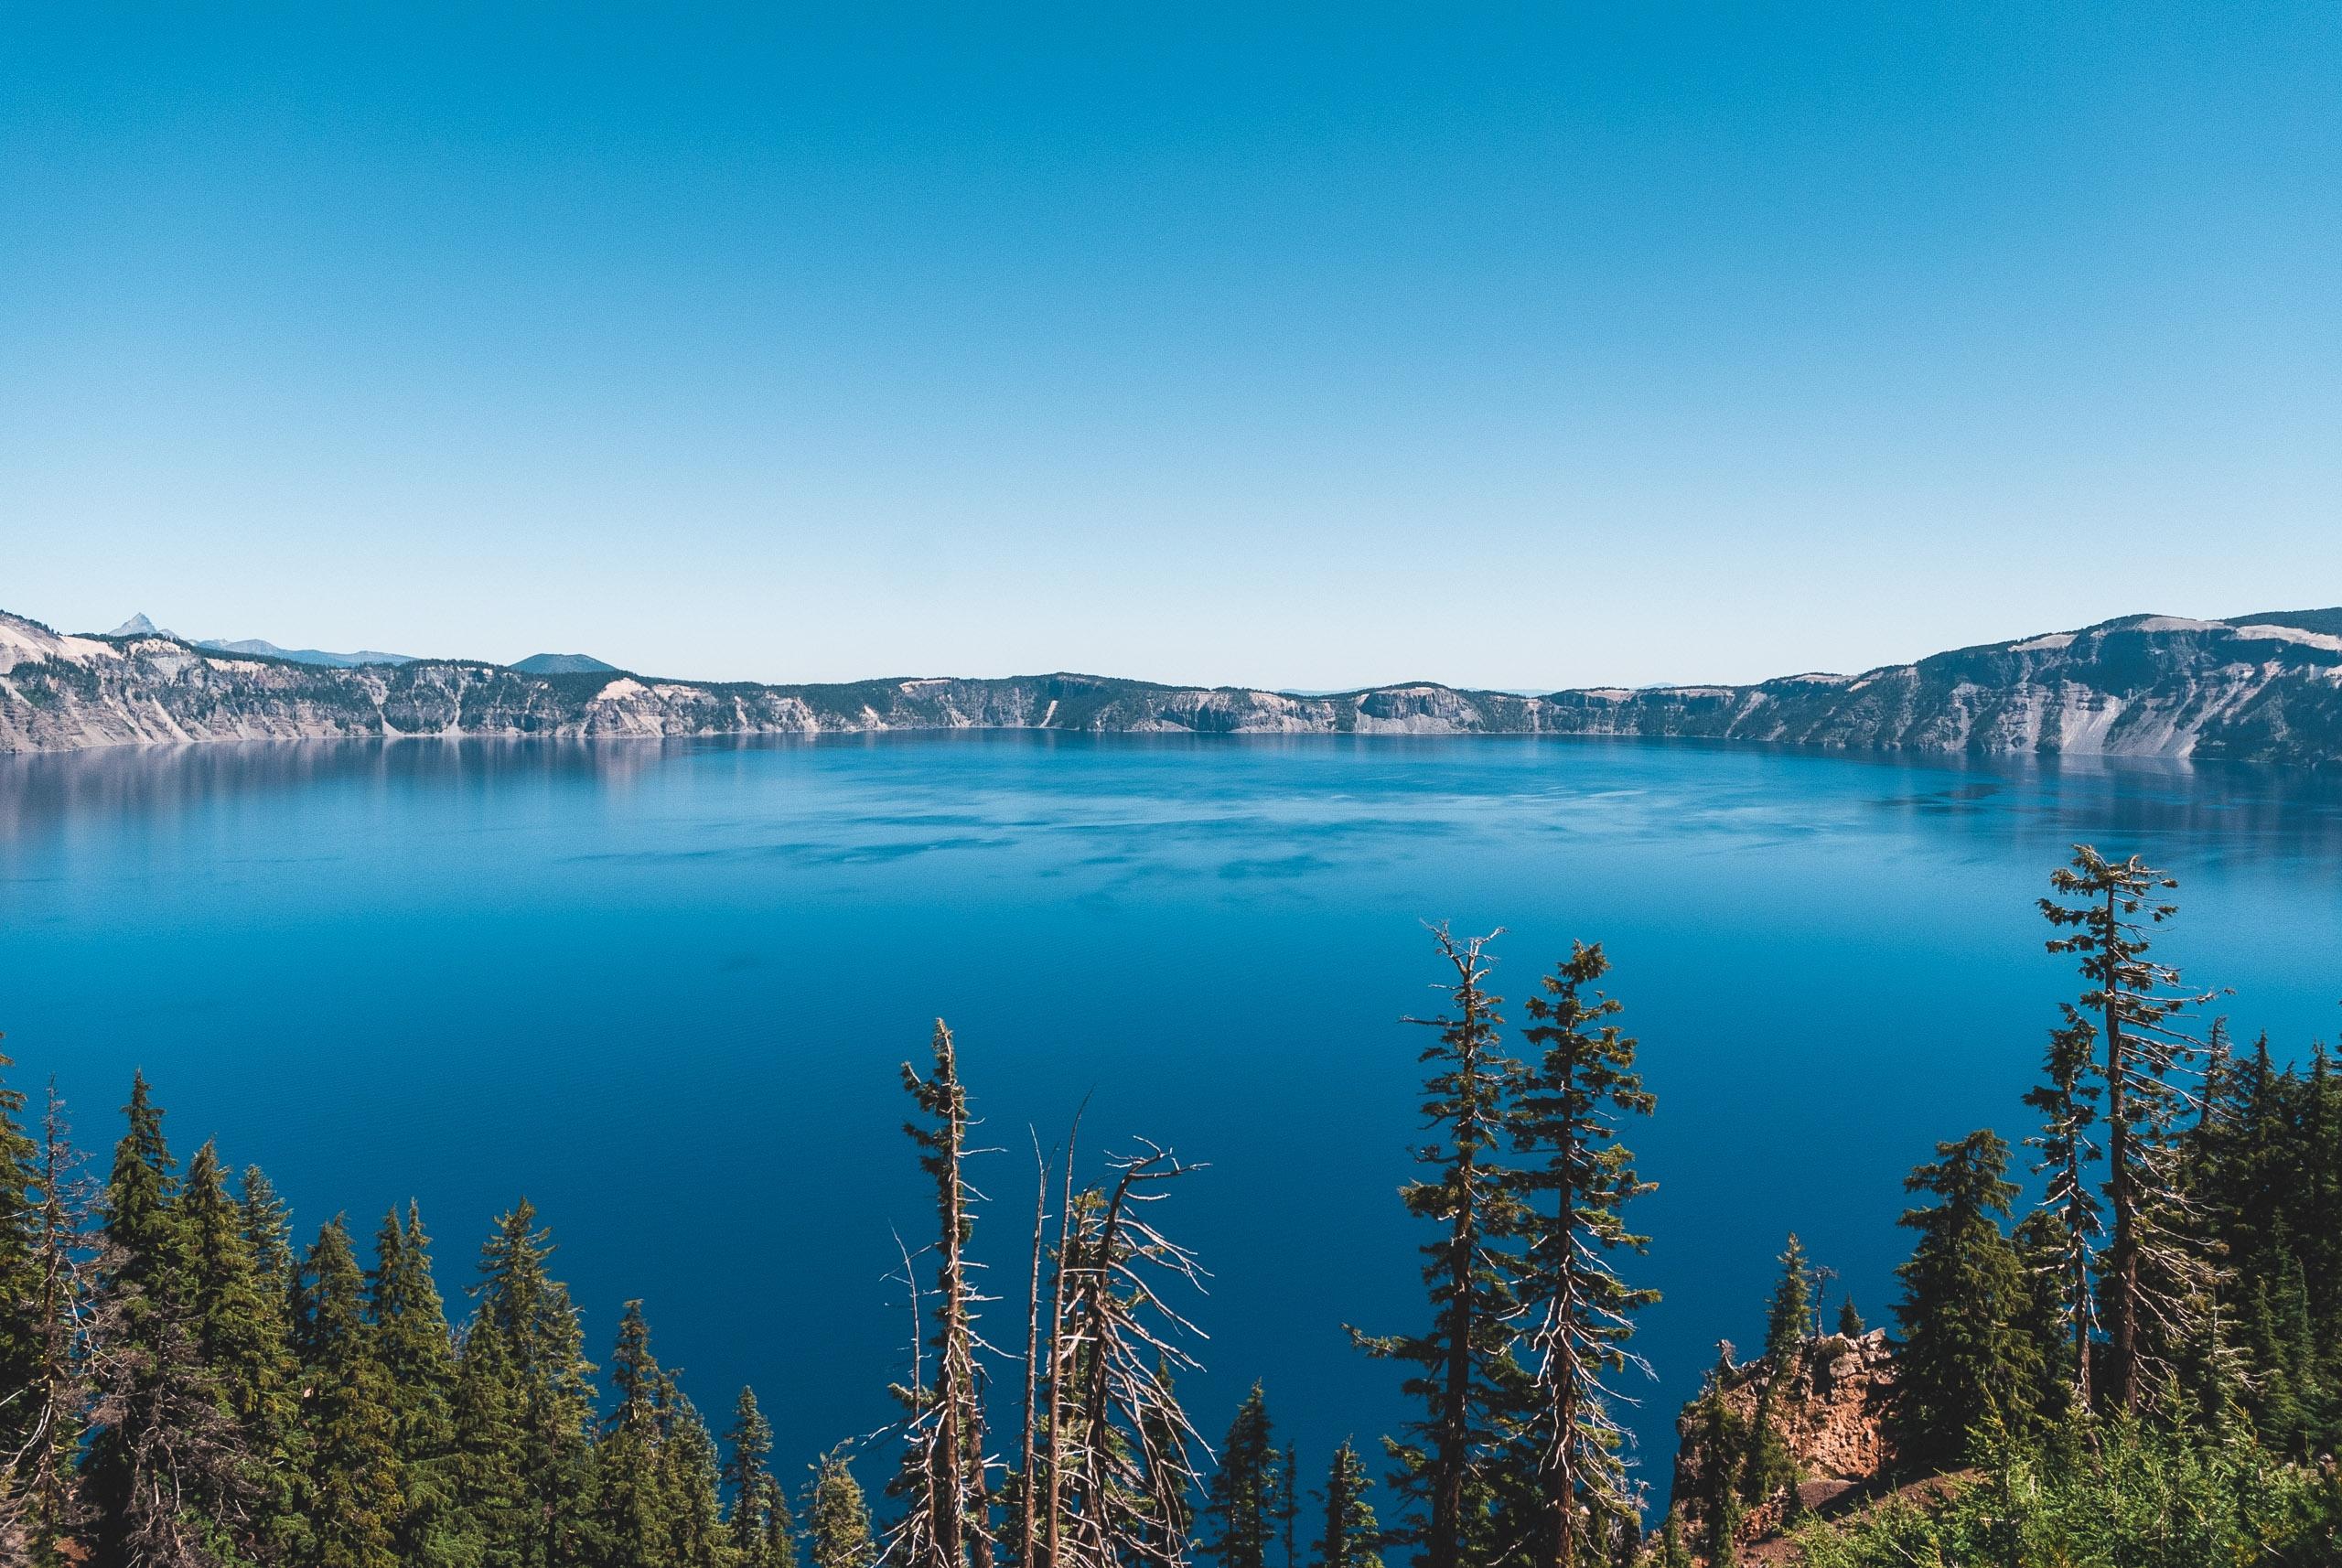 Crater Lake National Park - 2007-0822-DSC_0009_80492